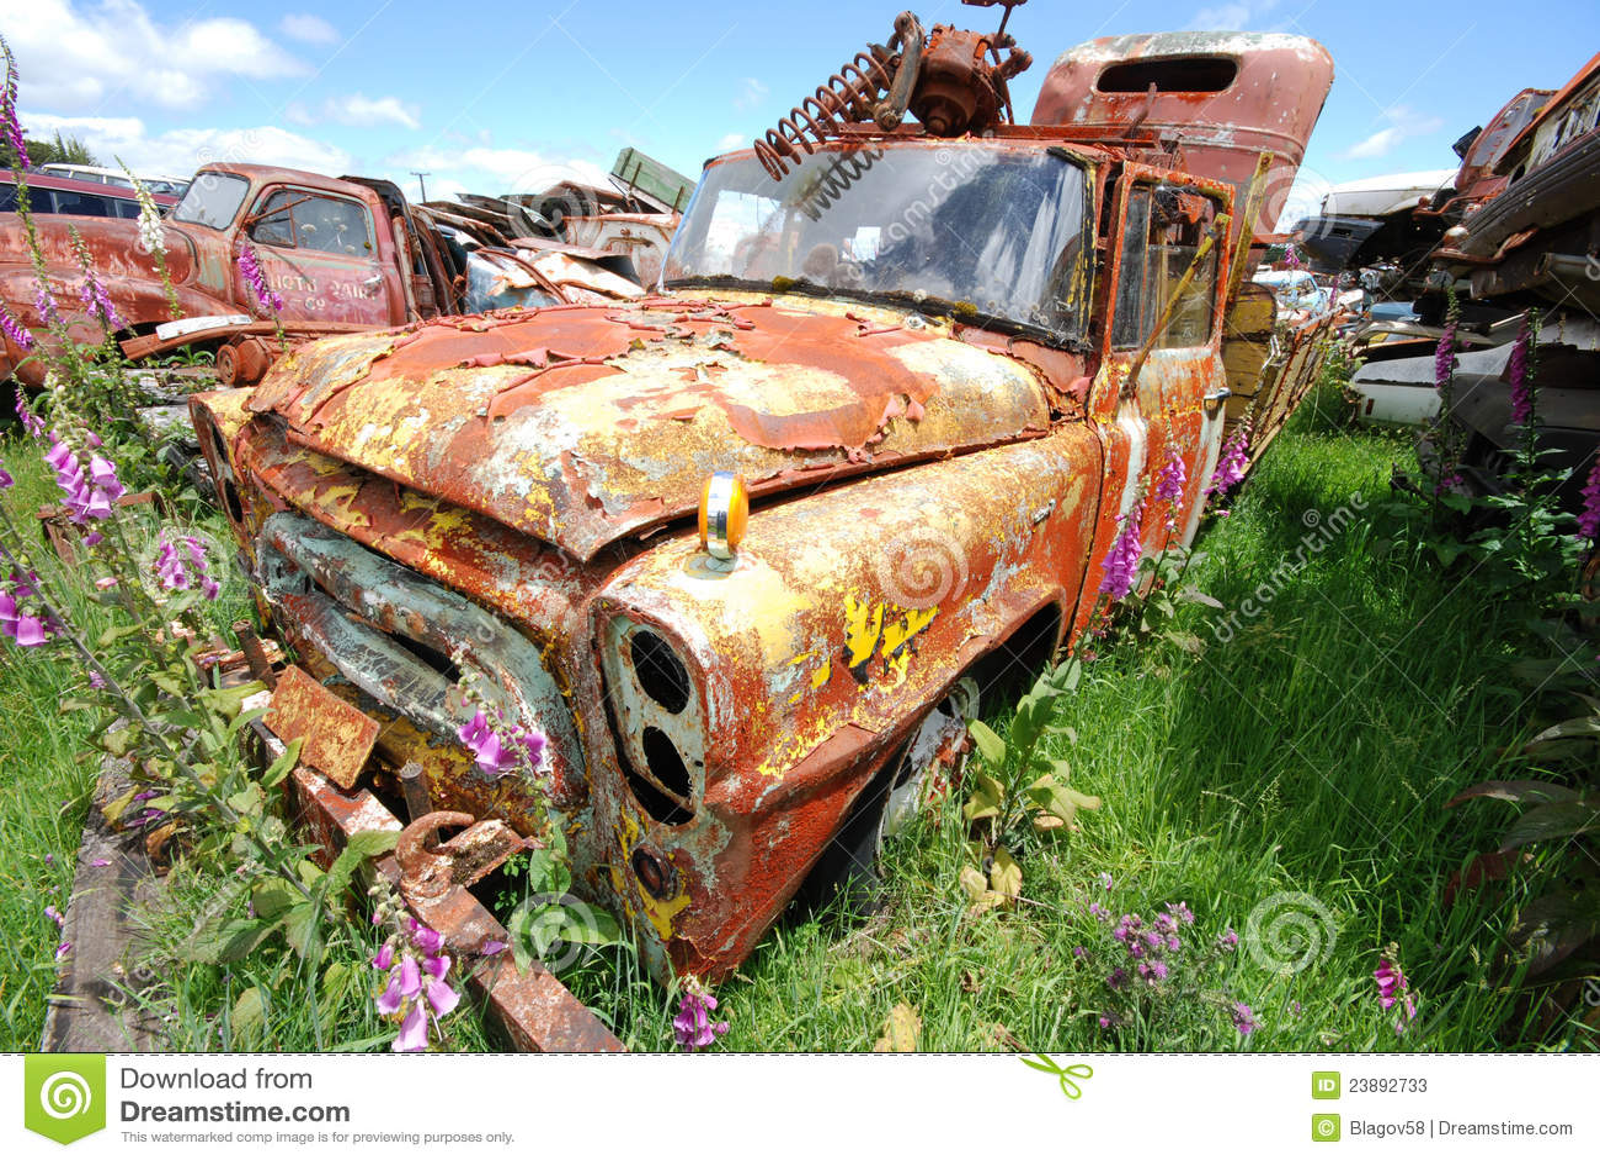 Old Rusty Pickup Trusk At A Car Junkyard Stock Image - Image of ...